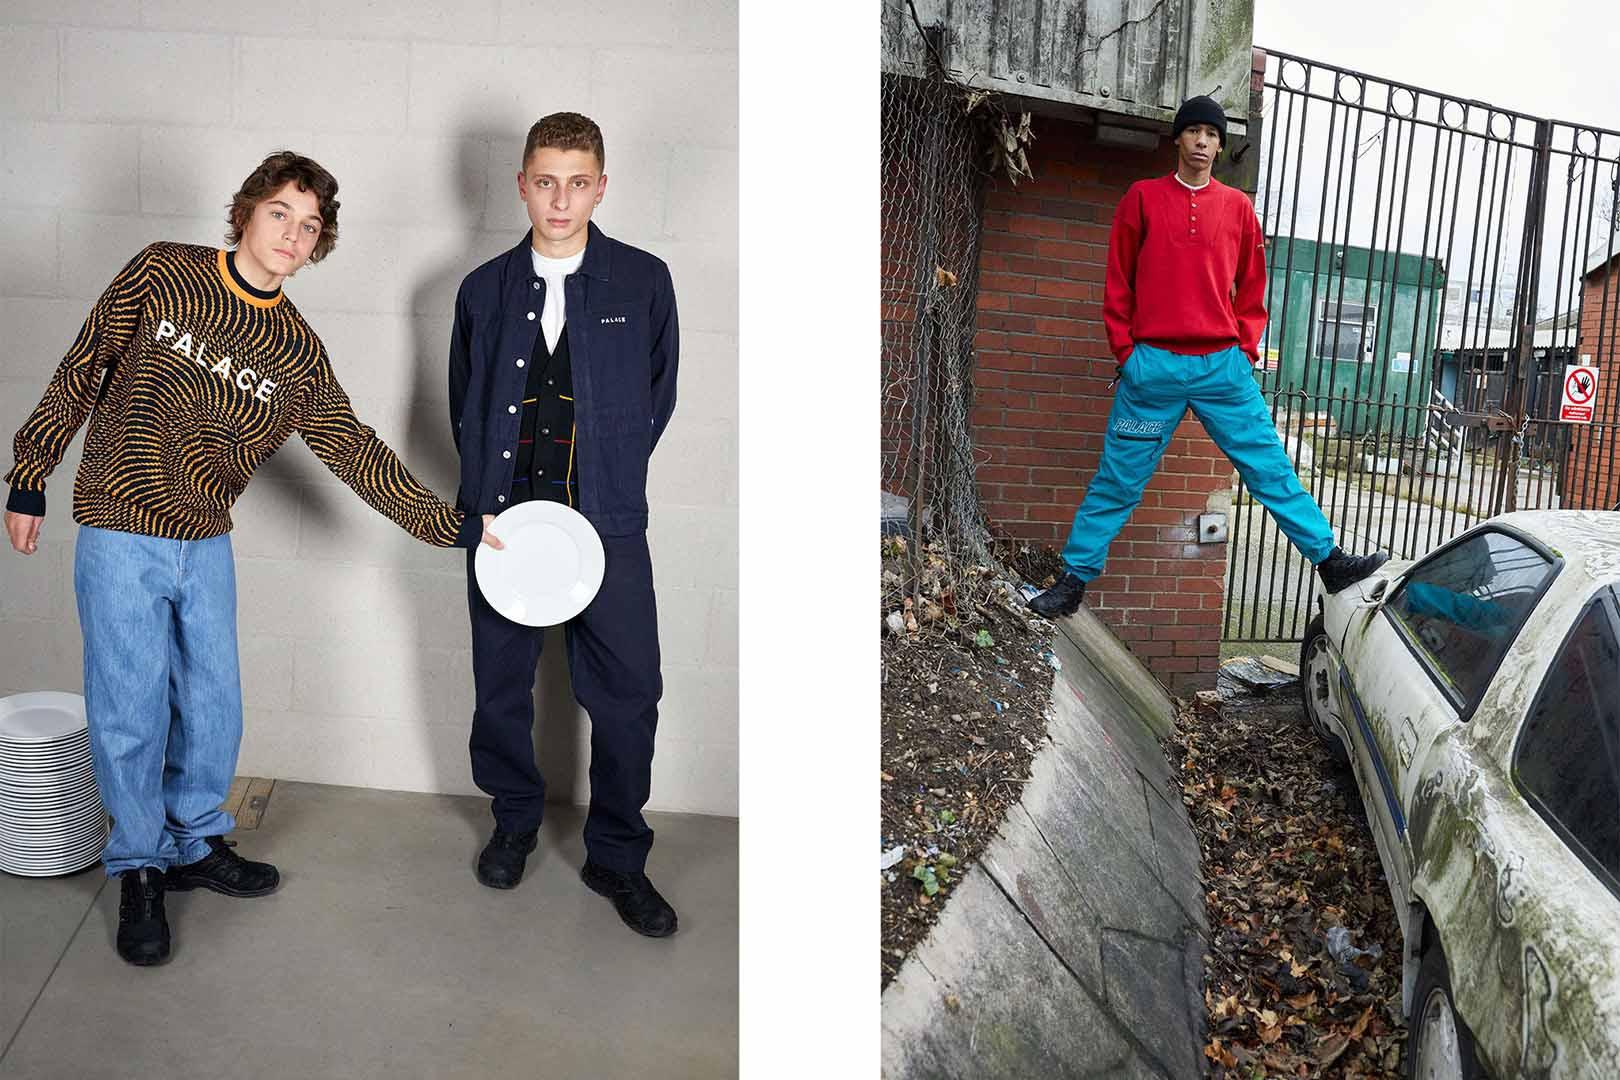 palace-skateboards-spring-2018-juergen-teller-16